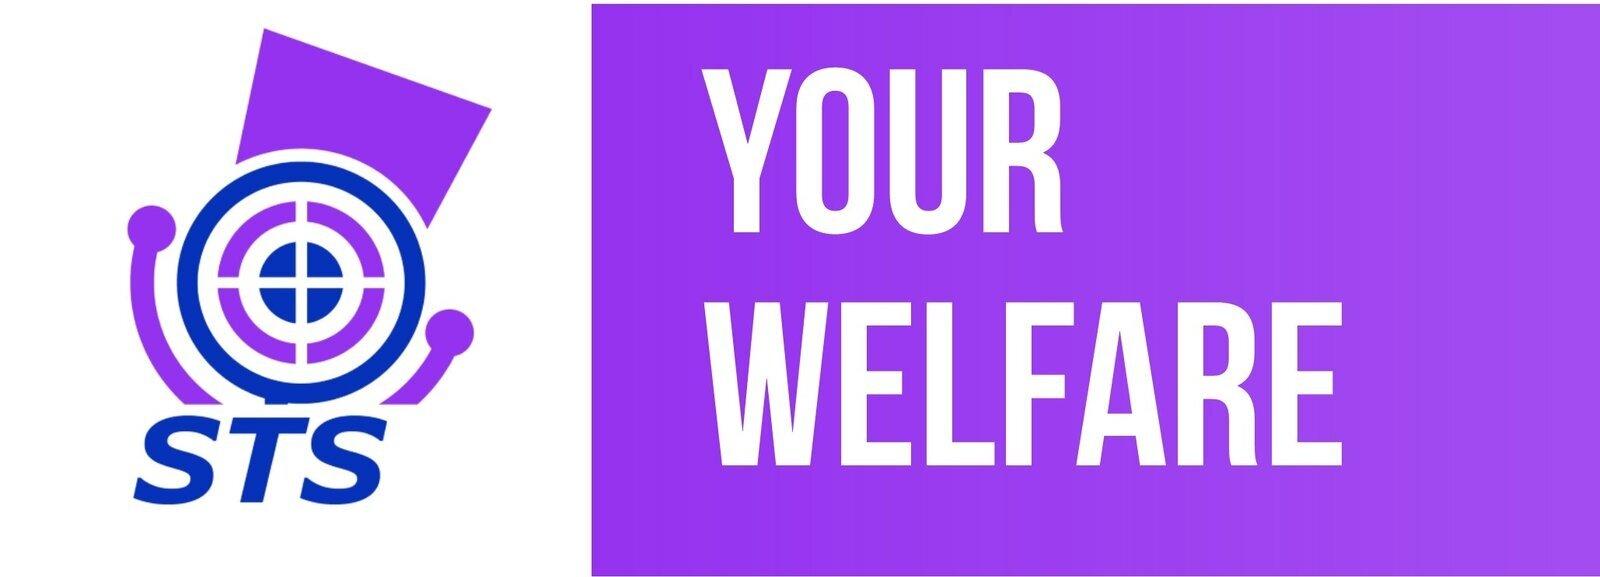 Your+Welfare.jpg